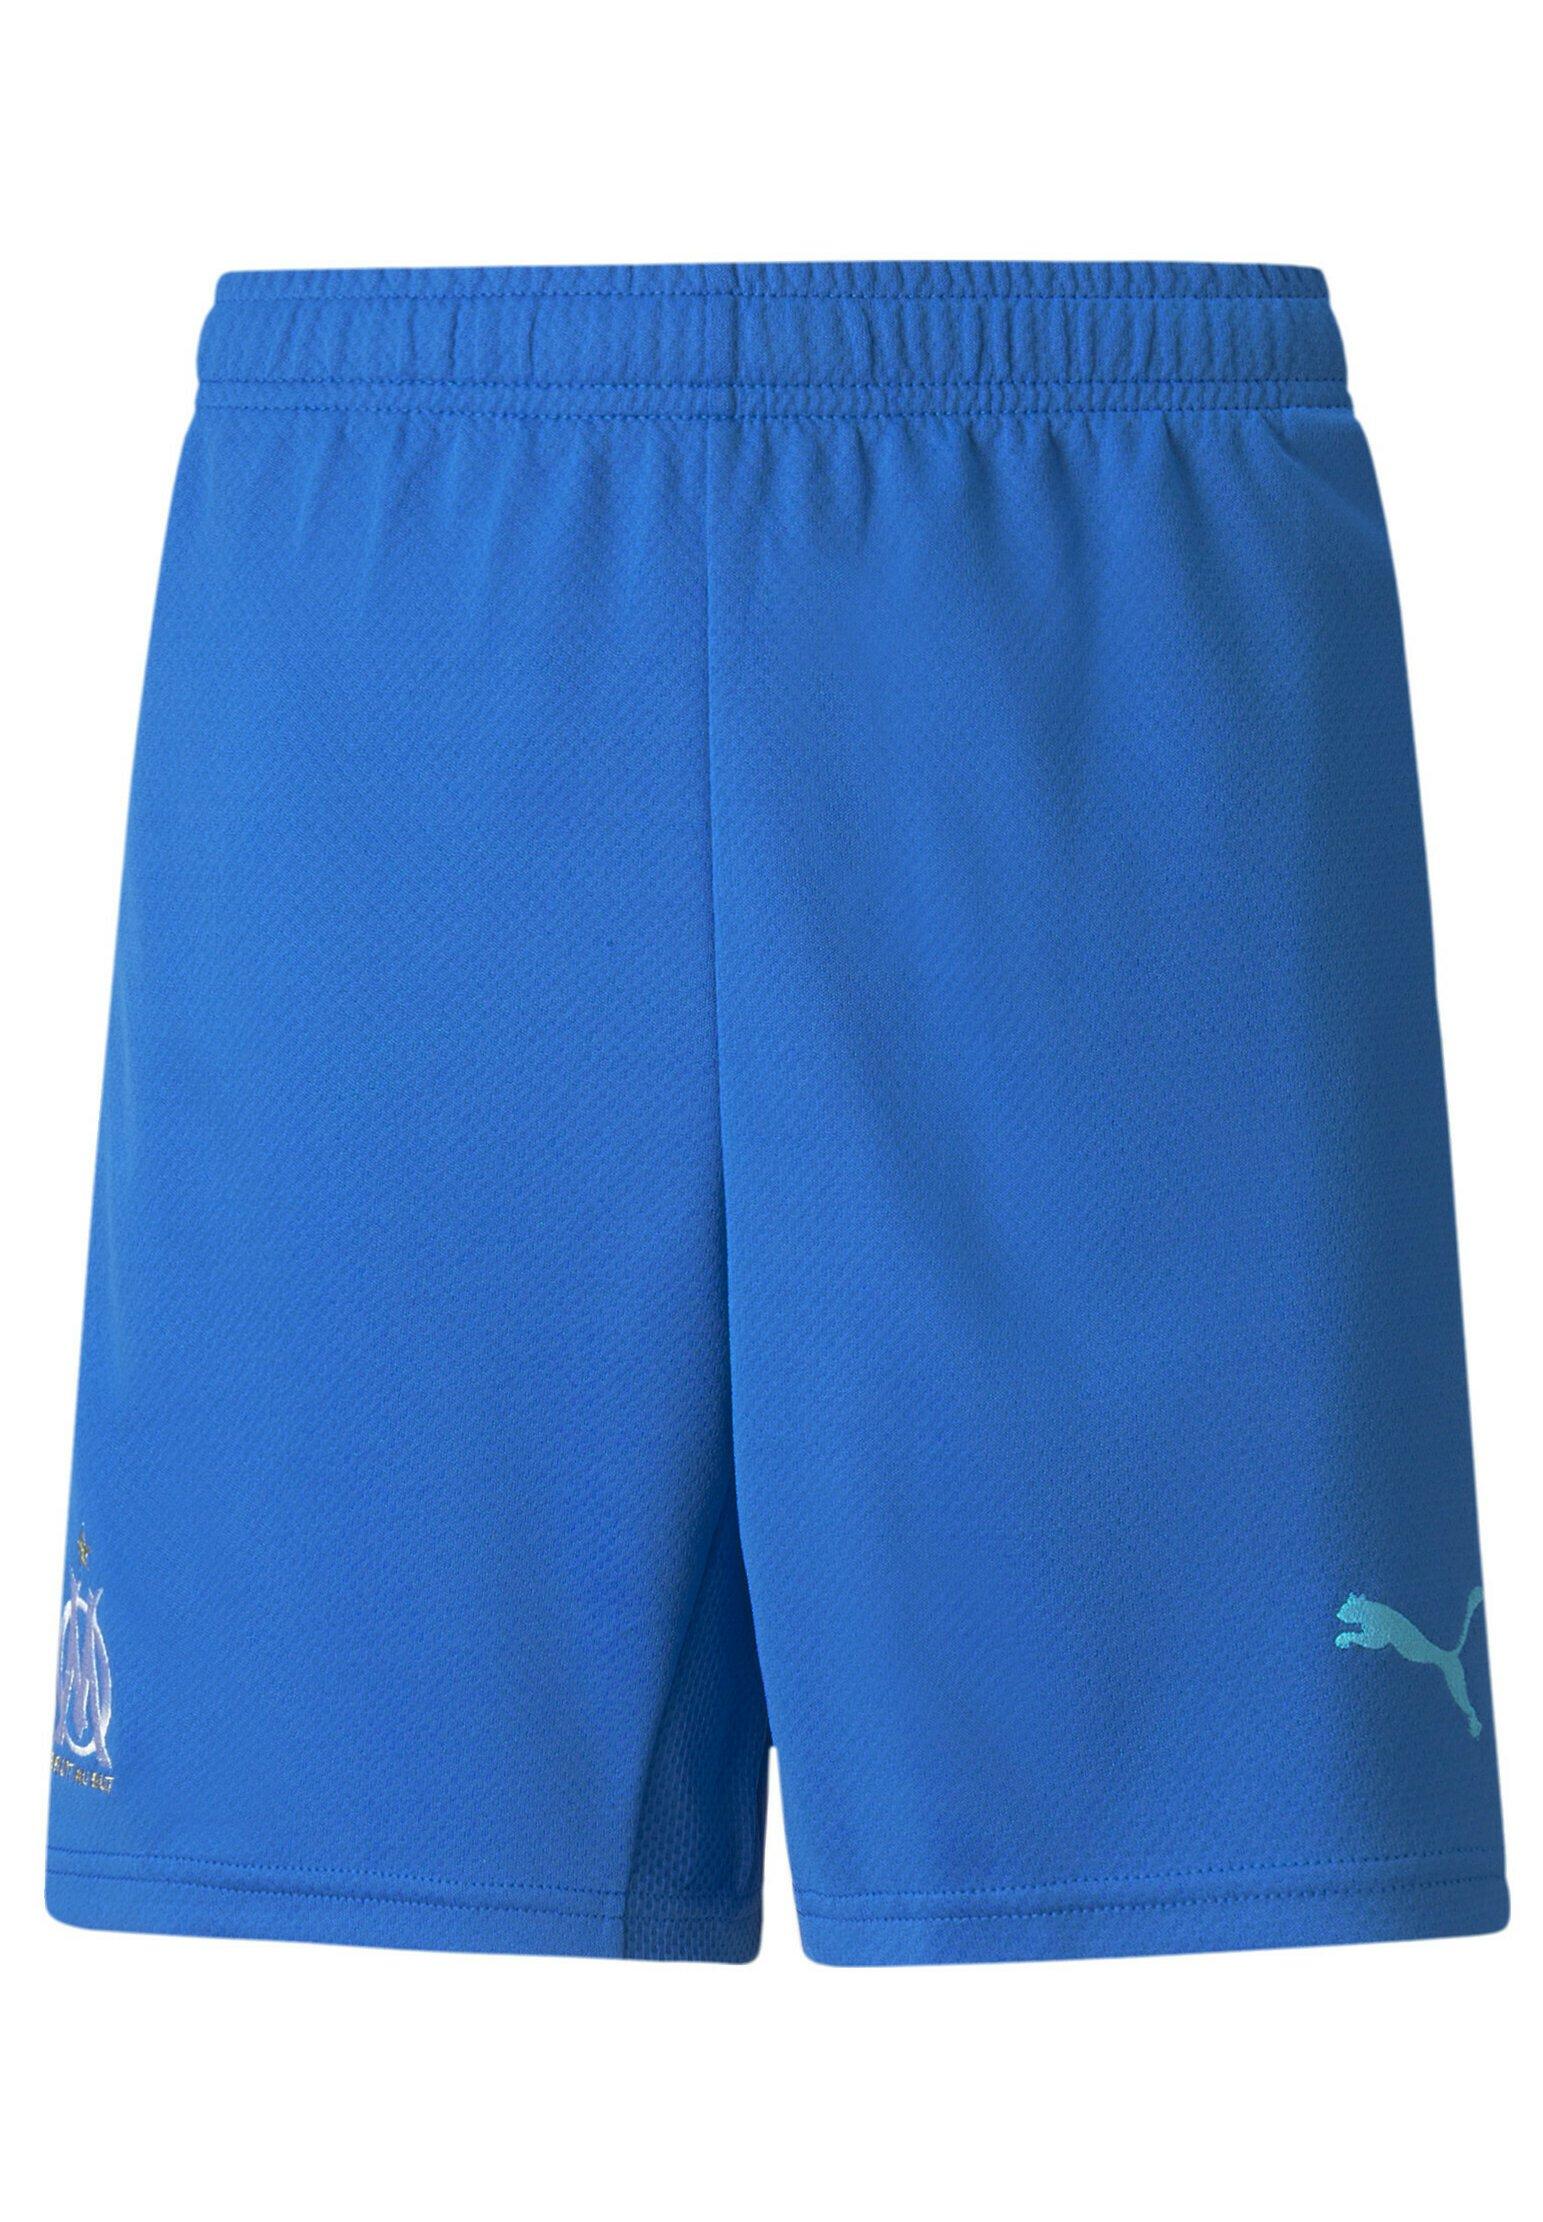 Bambini OM THIRD REPLICA YOUTH FOOTBALL UNISEX - Shorts